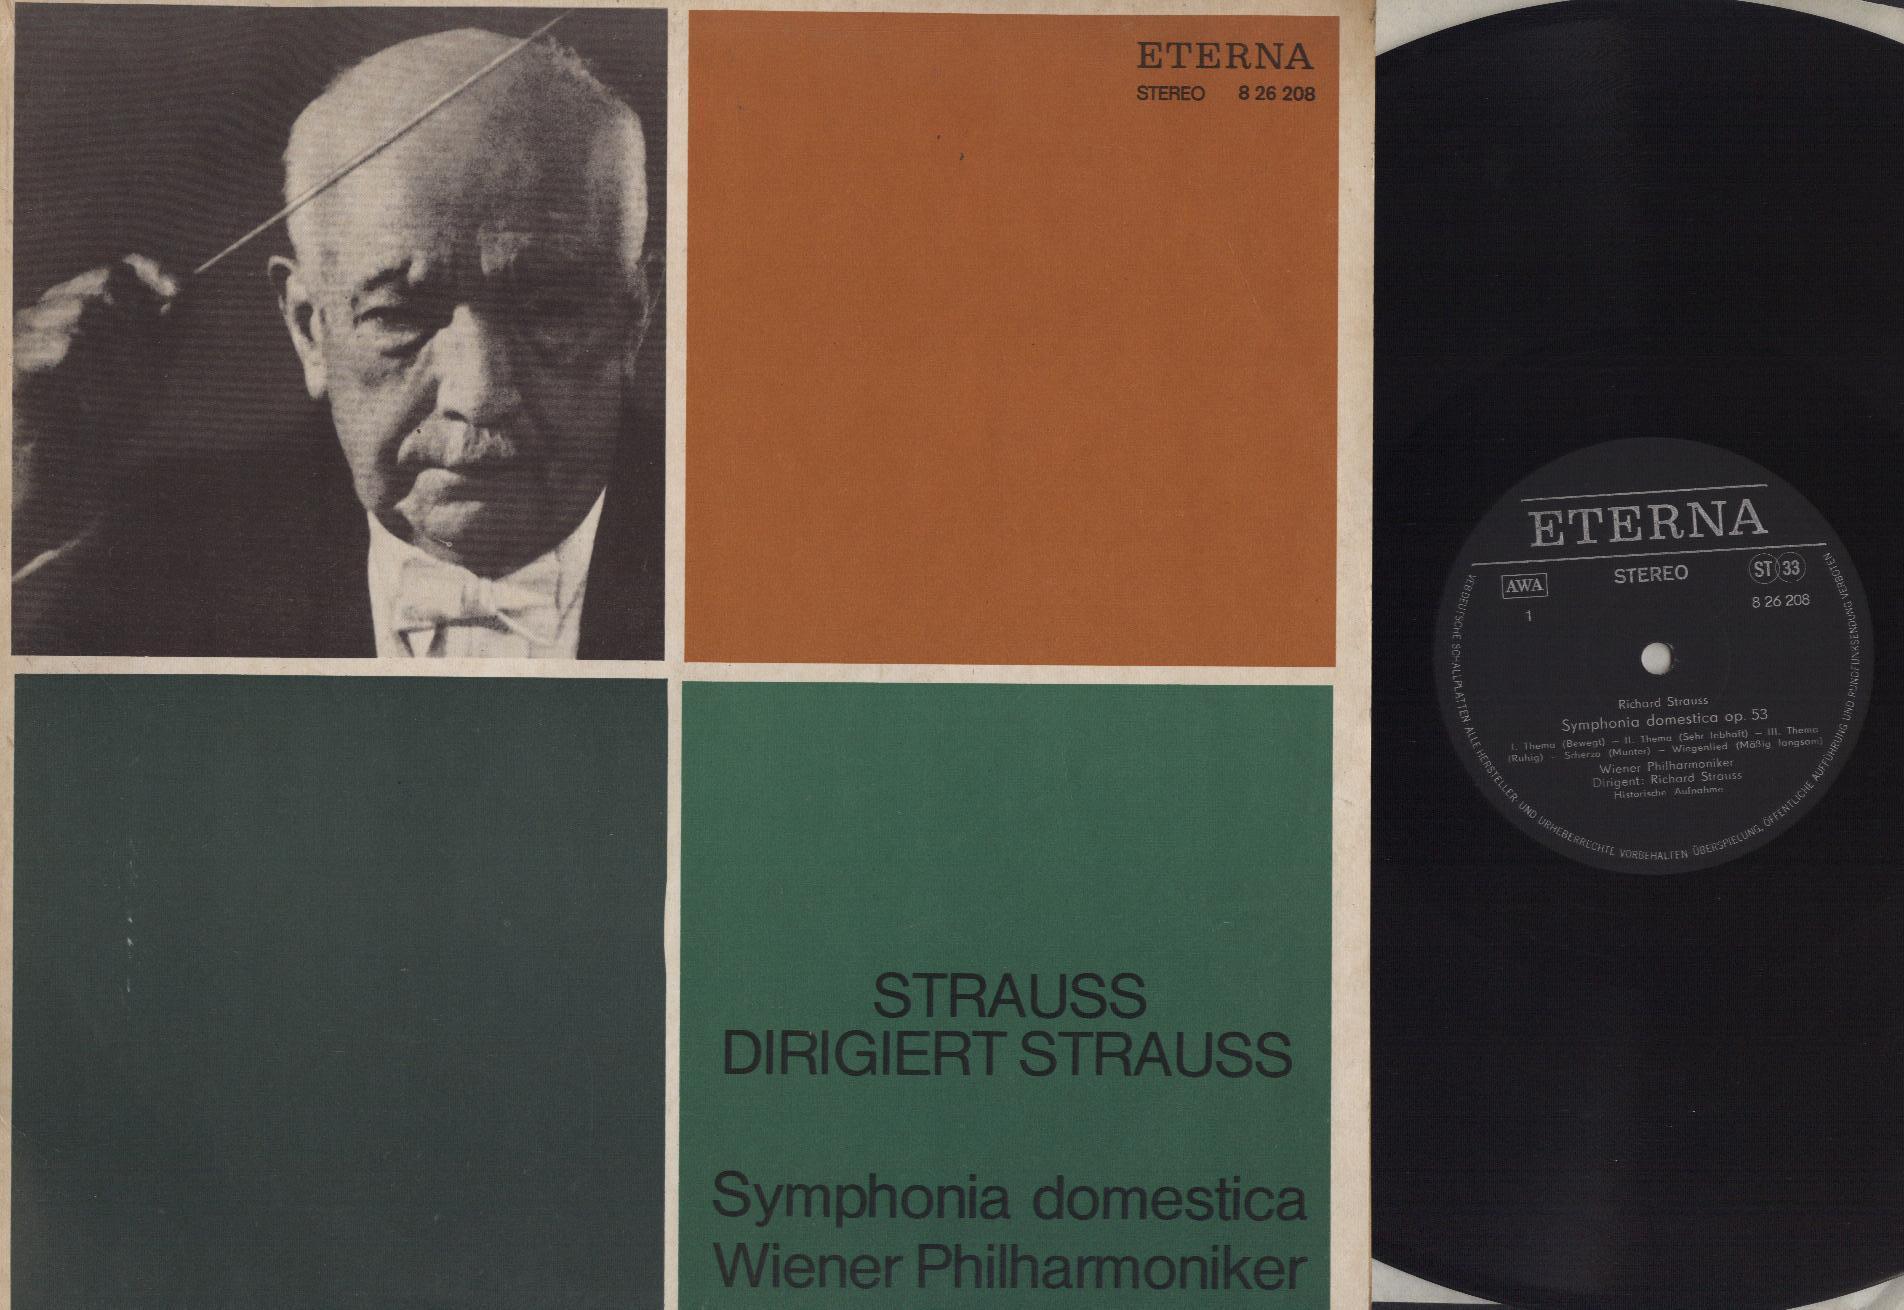 Richard Strauss, Wiener Philharmoniker - Symphonia Domestica Op.53 - LP